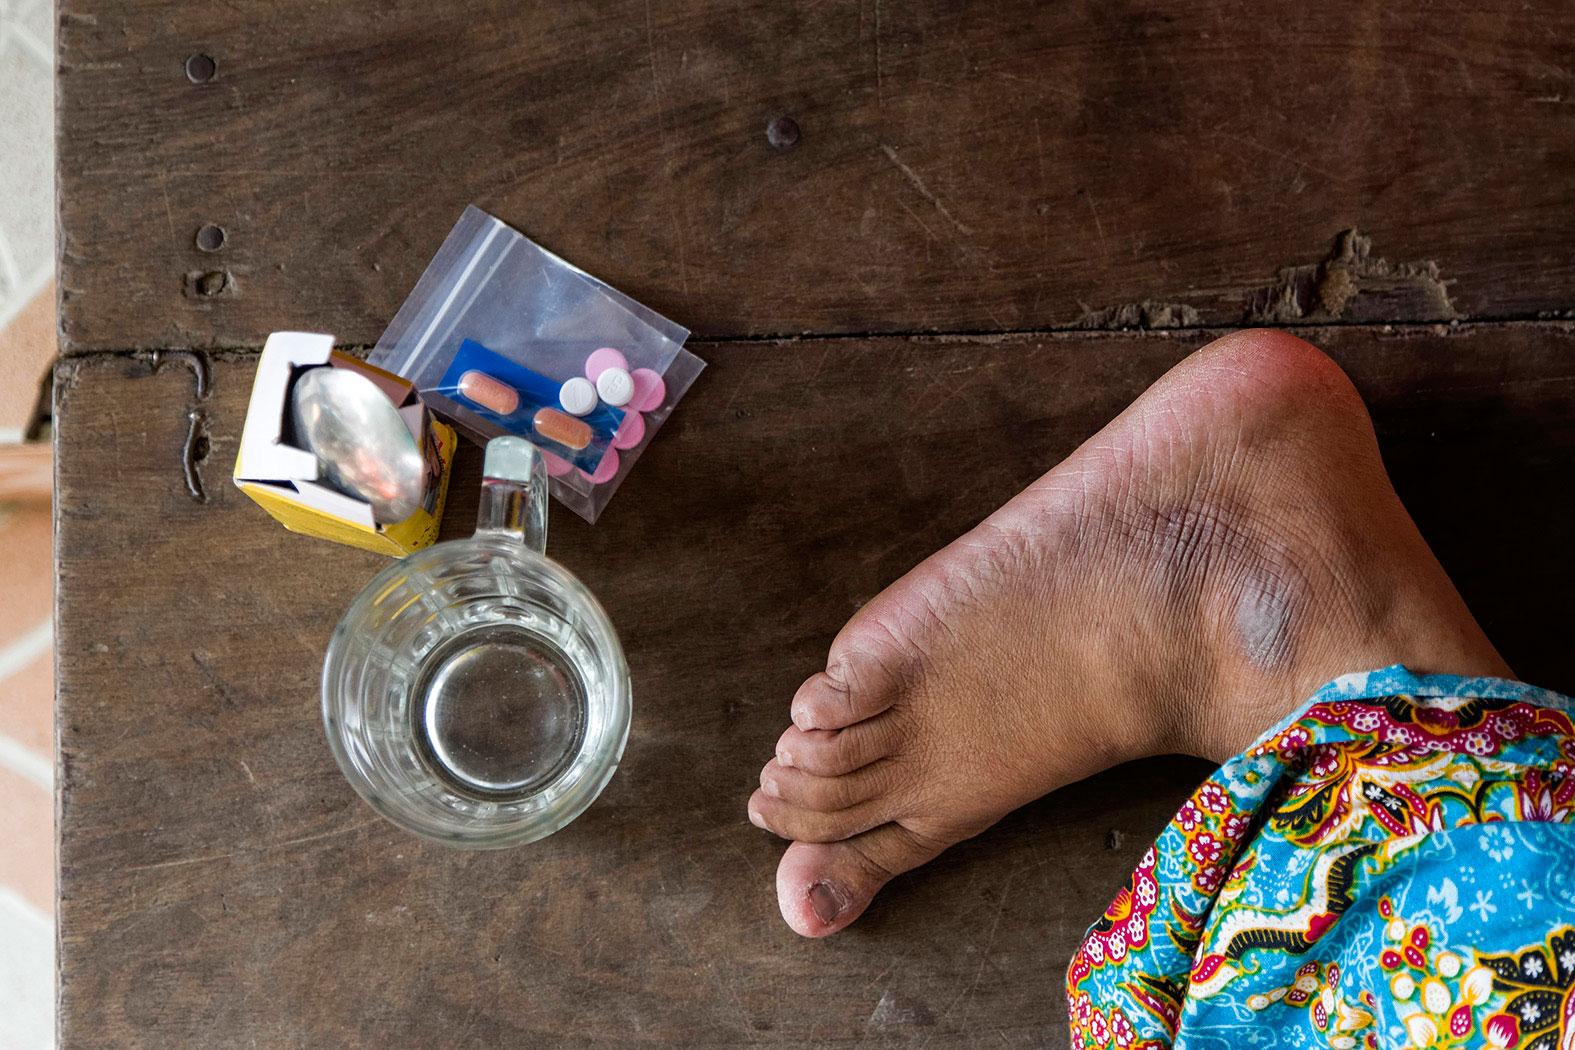 ANTI-HIV EFFORTS IN A SLUM IN PHNOM PENH